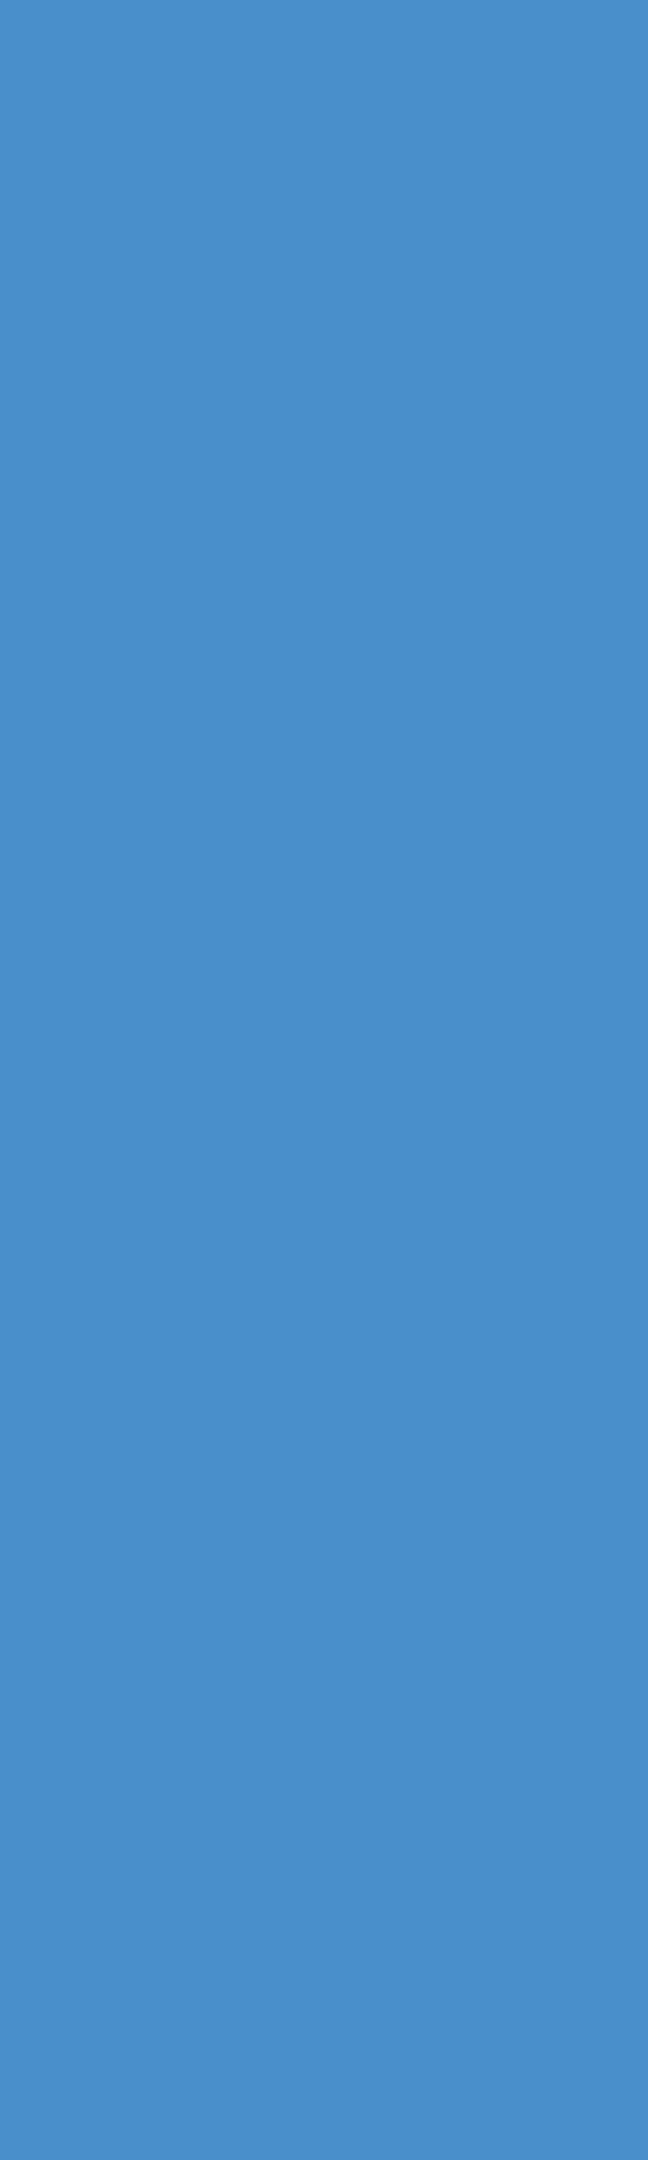 Blue Background-1.jpg